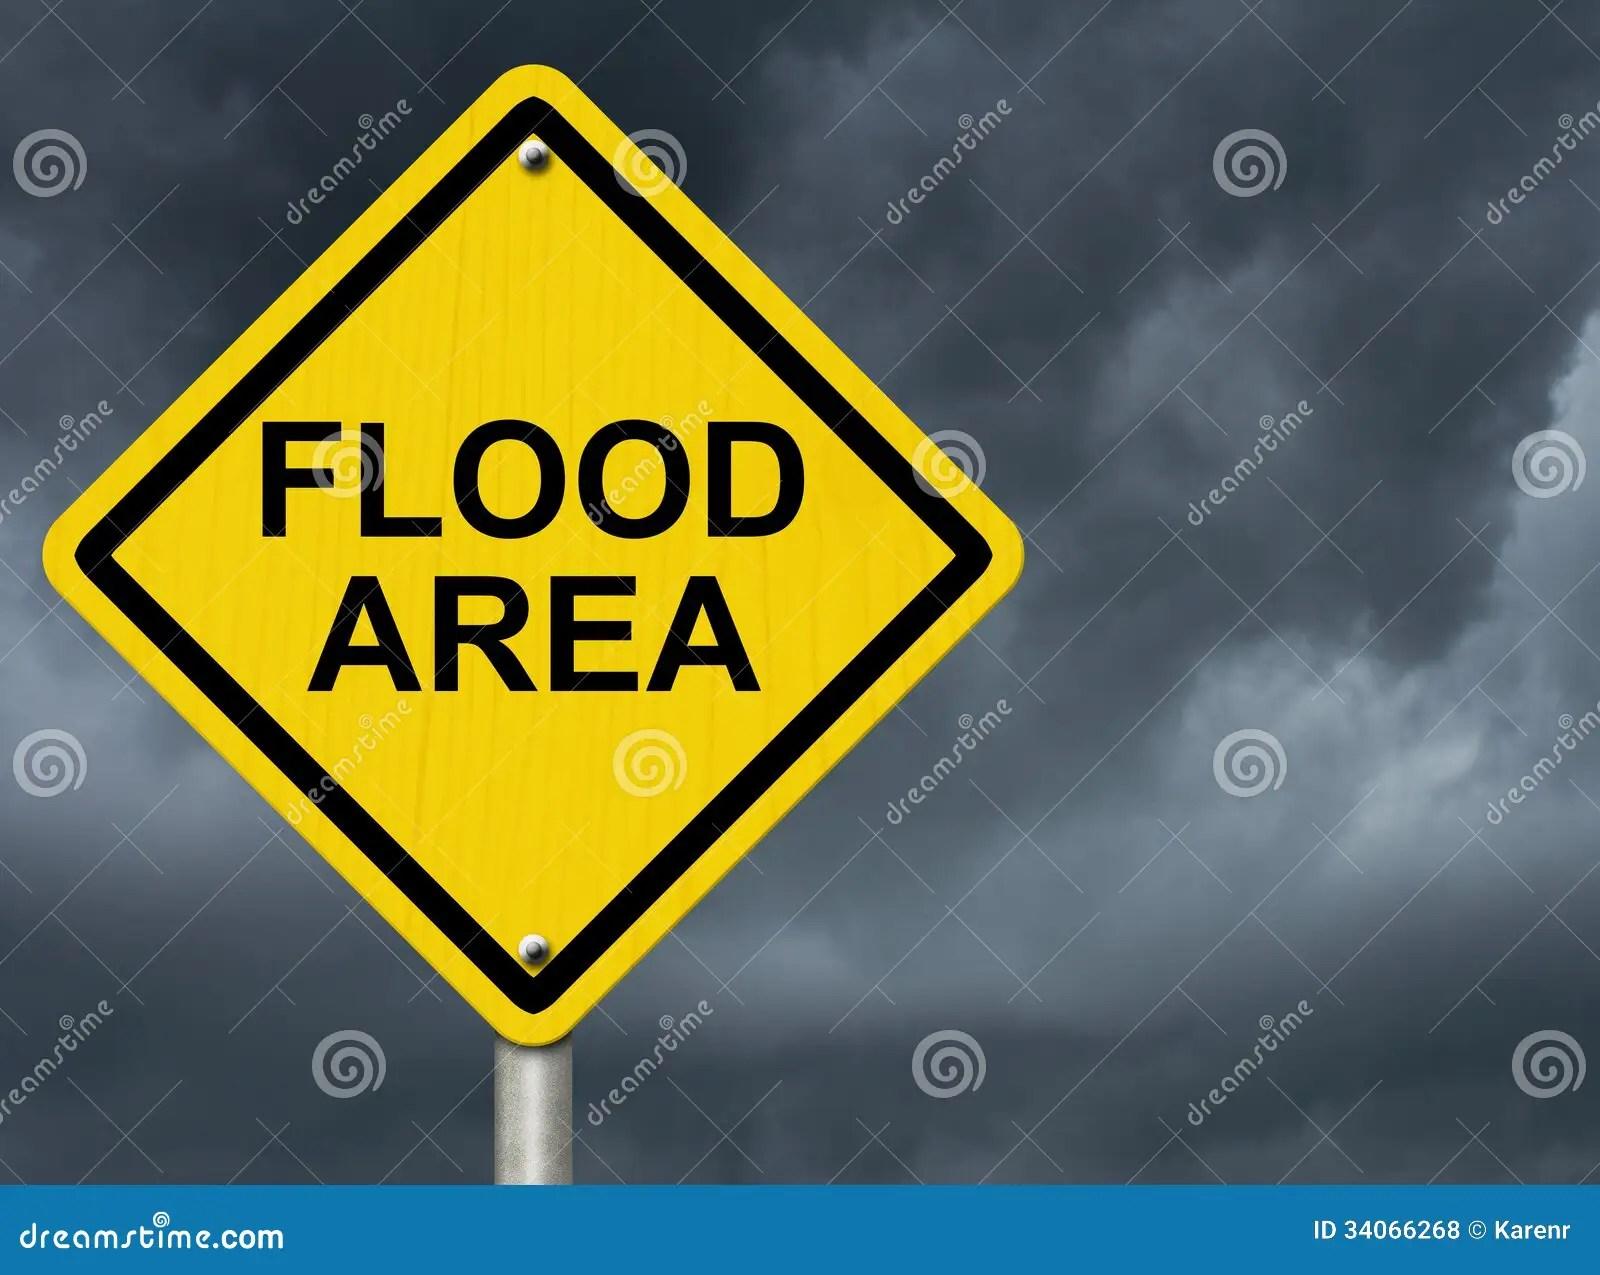 Flood Warning Royalty Free Stock Photos  Image 34066268